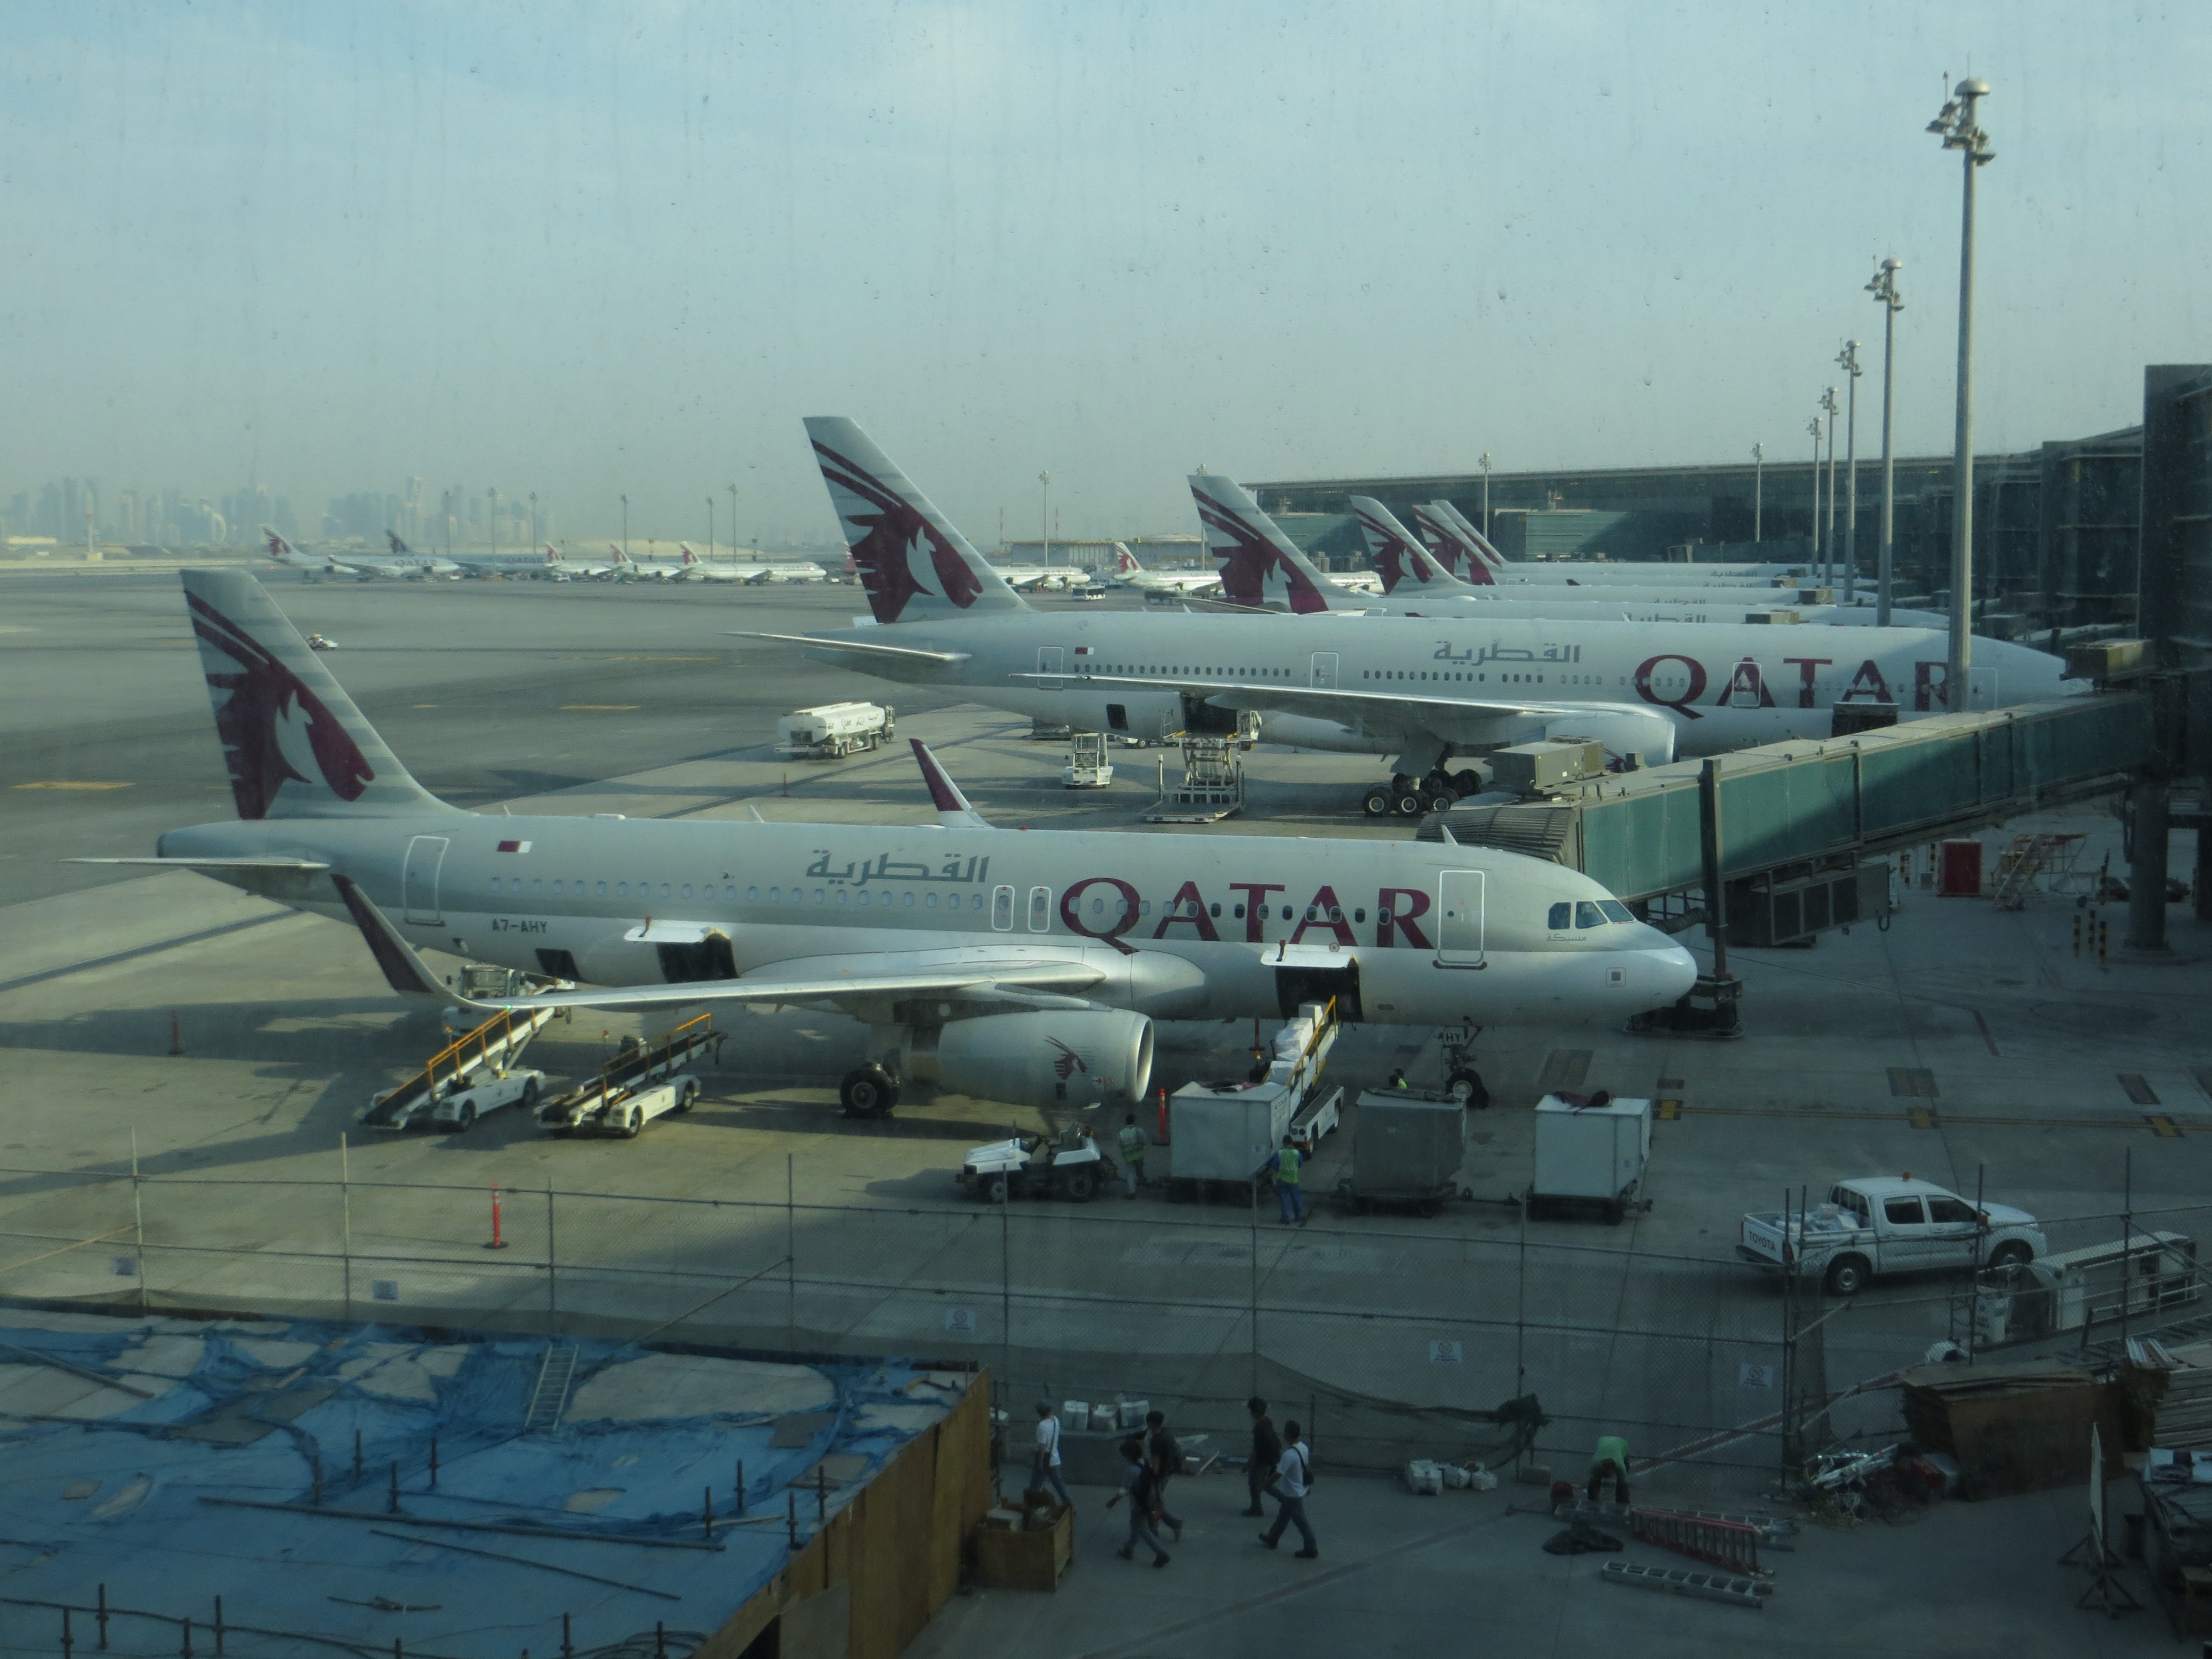 Aeroporto Hamad : File qr aircraft at hamad airport g wikimedia